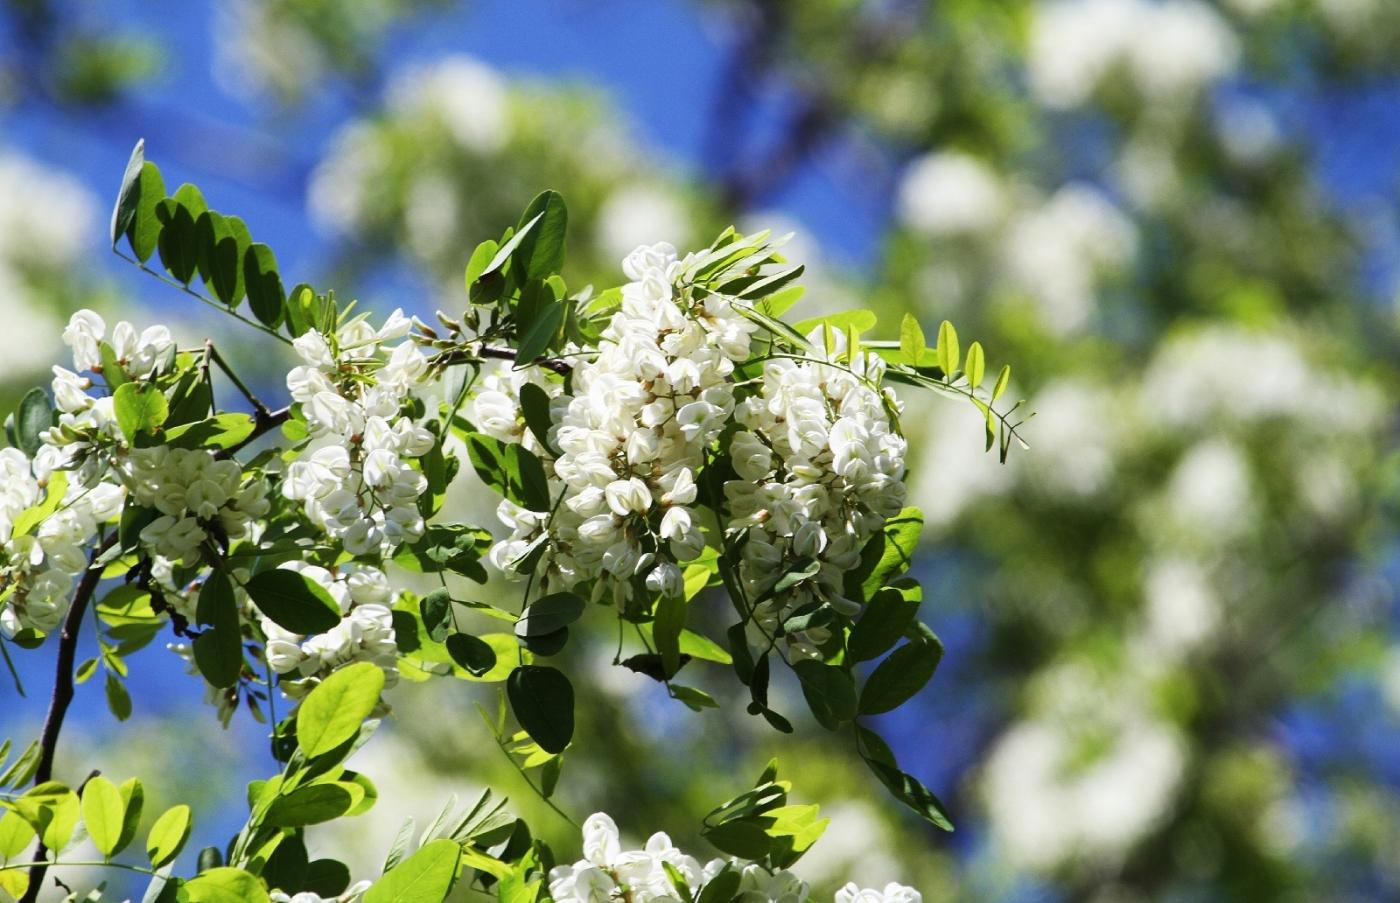 【田螺随拍】美国黄杨american yellowwood_图1-13